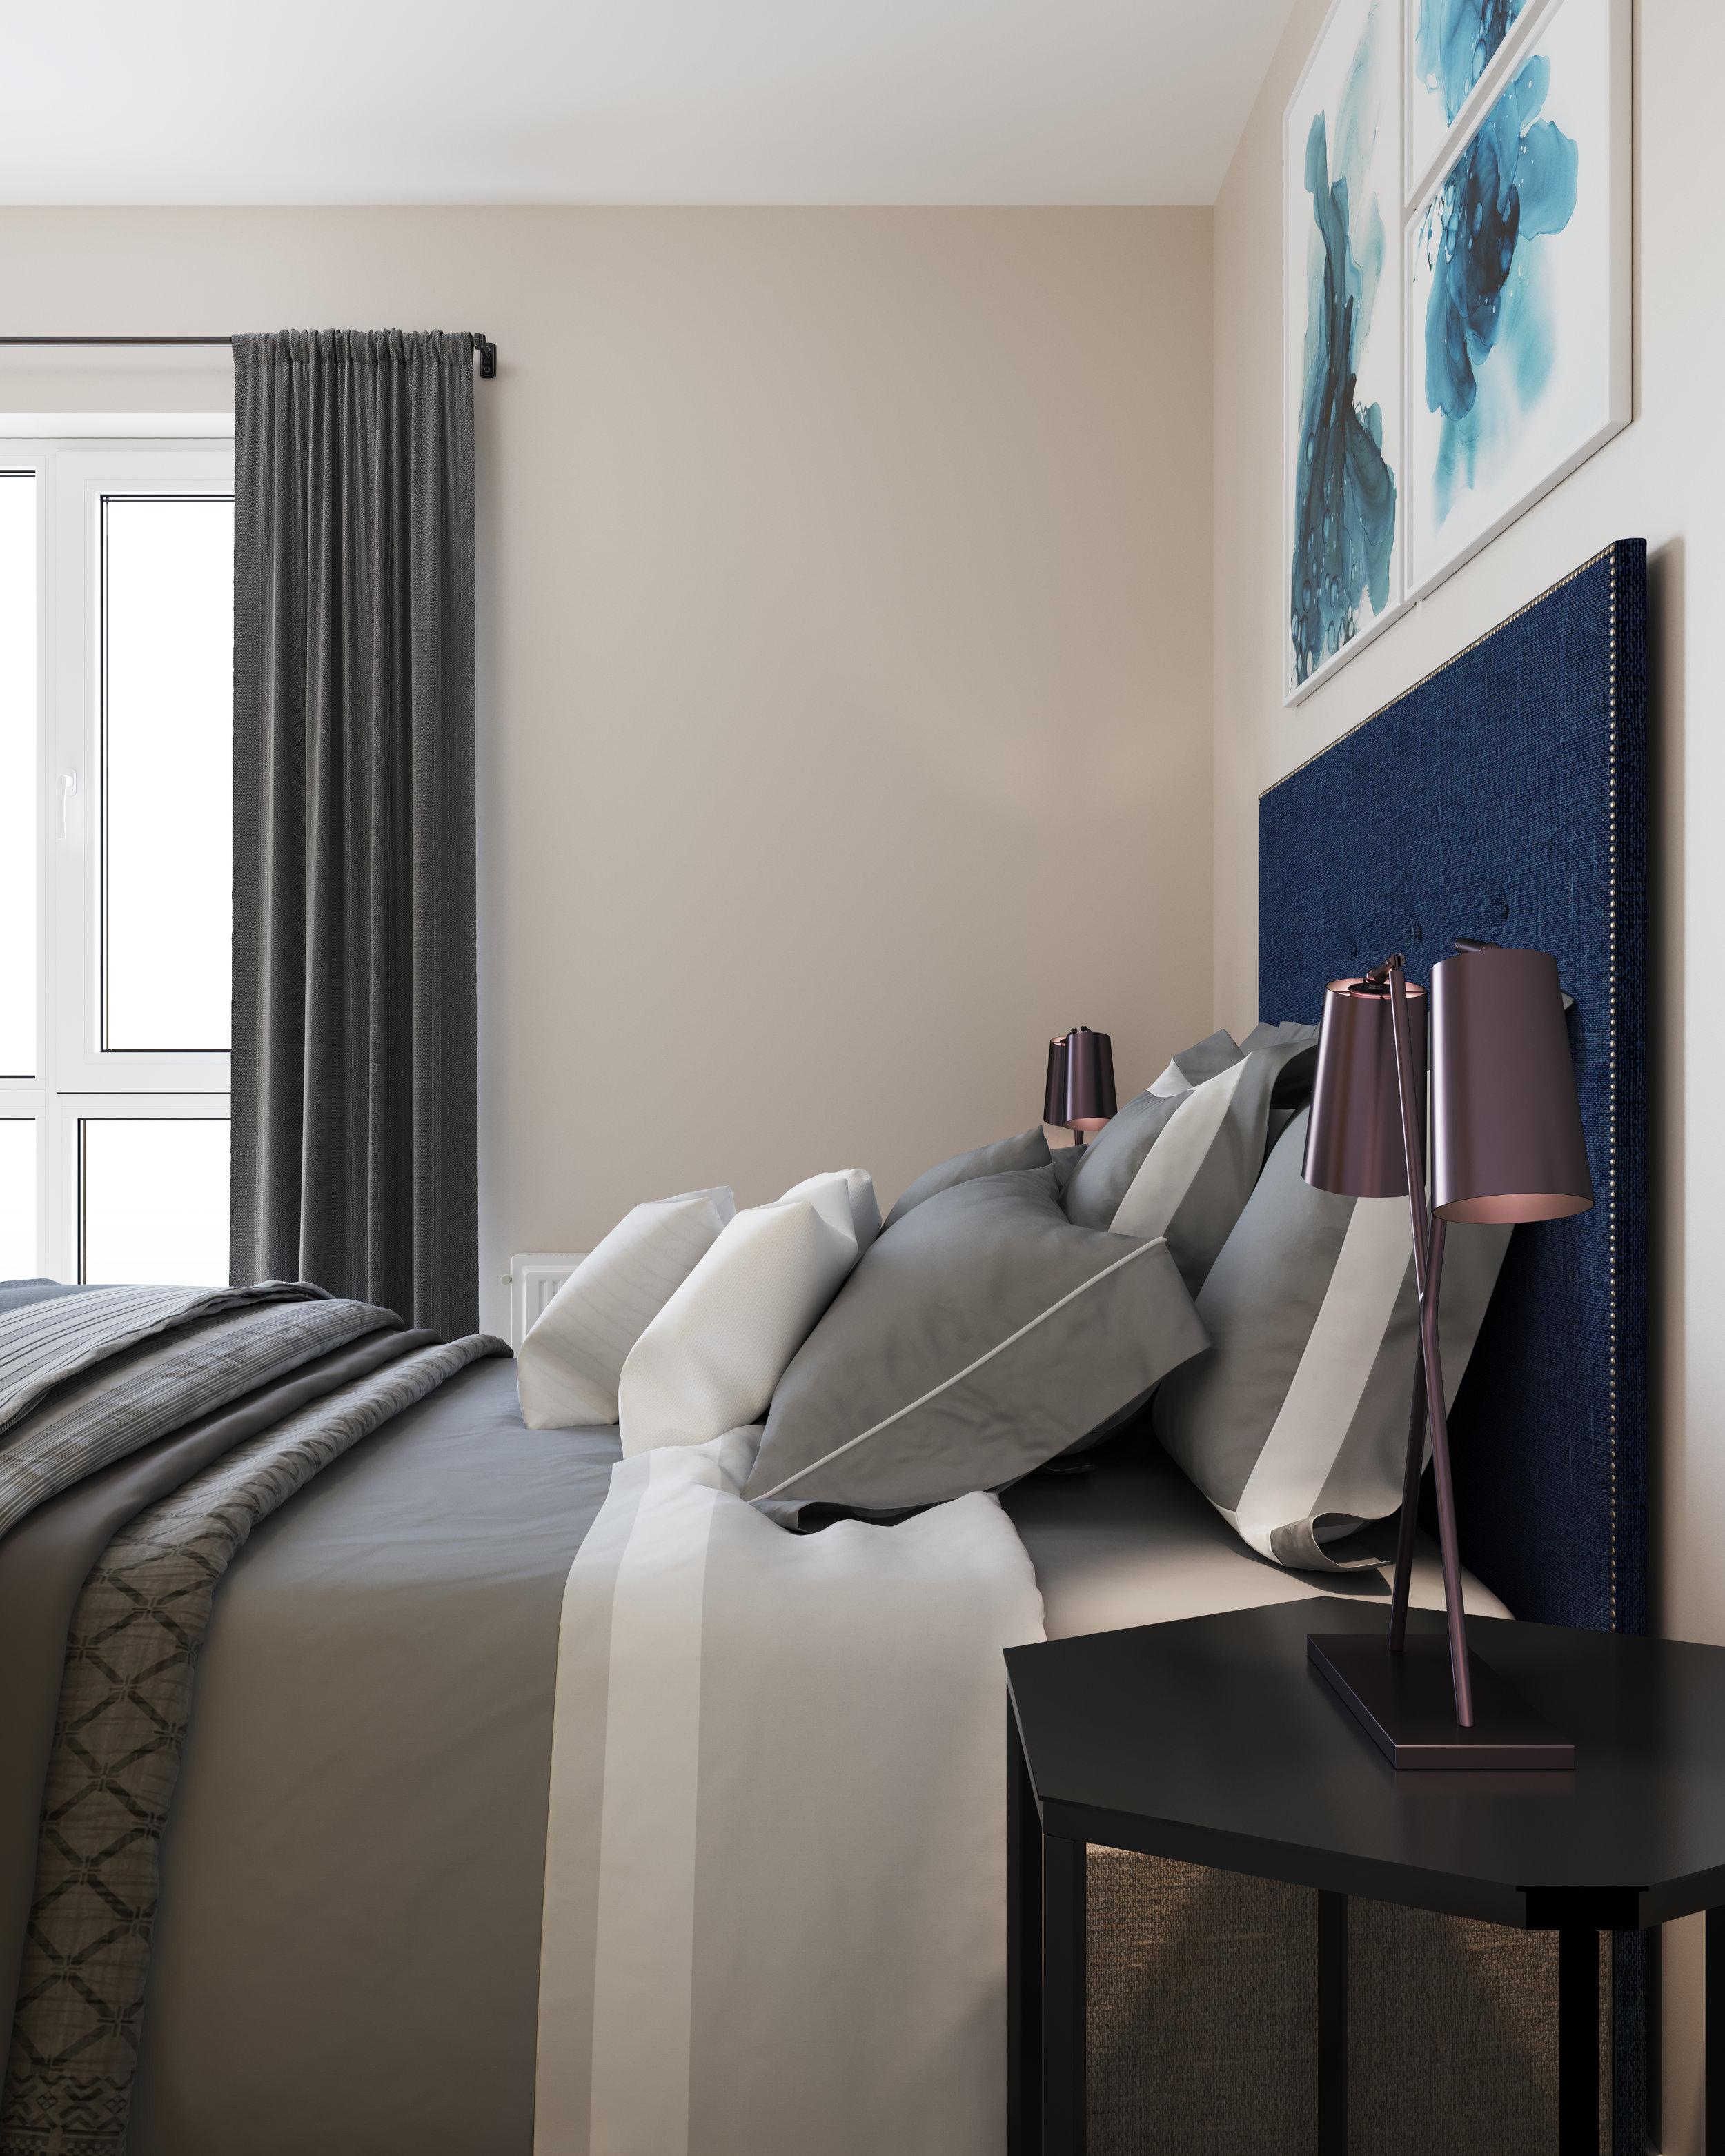 KBB - Bedroom CGI.jpg